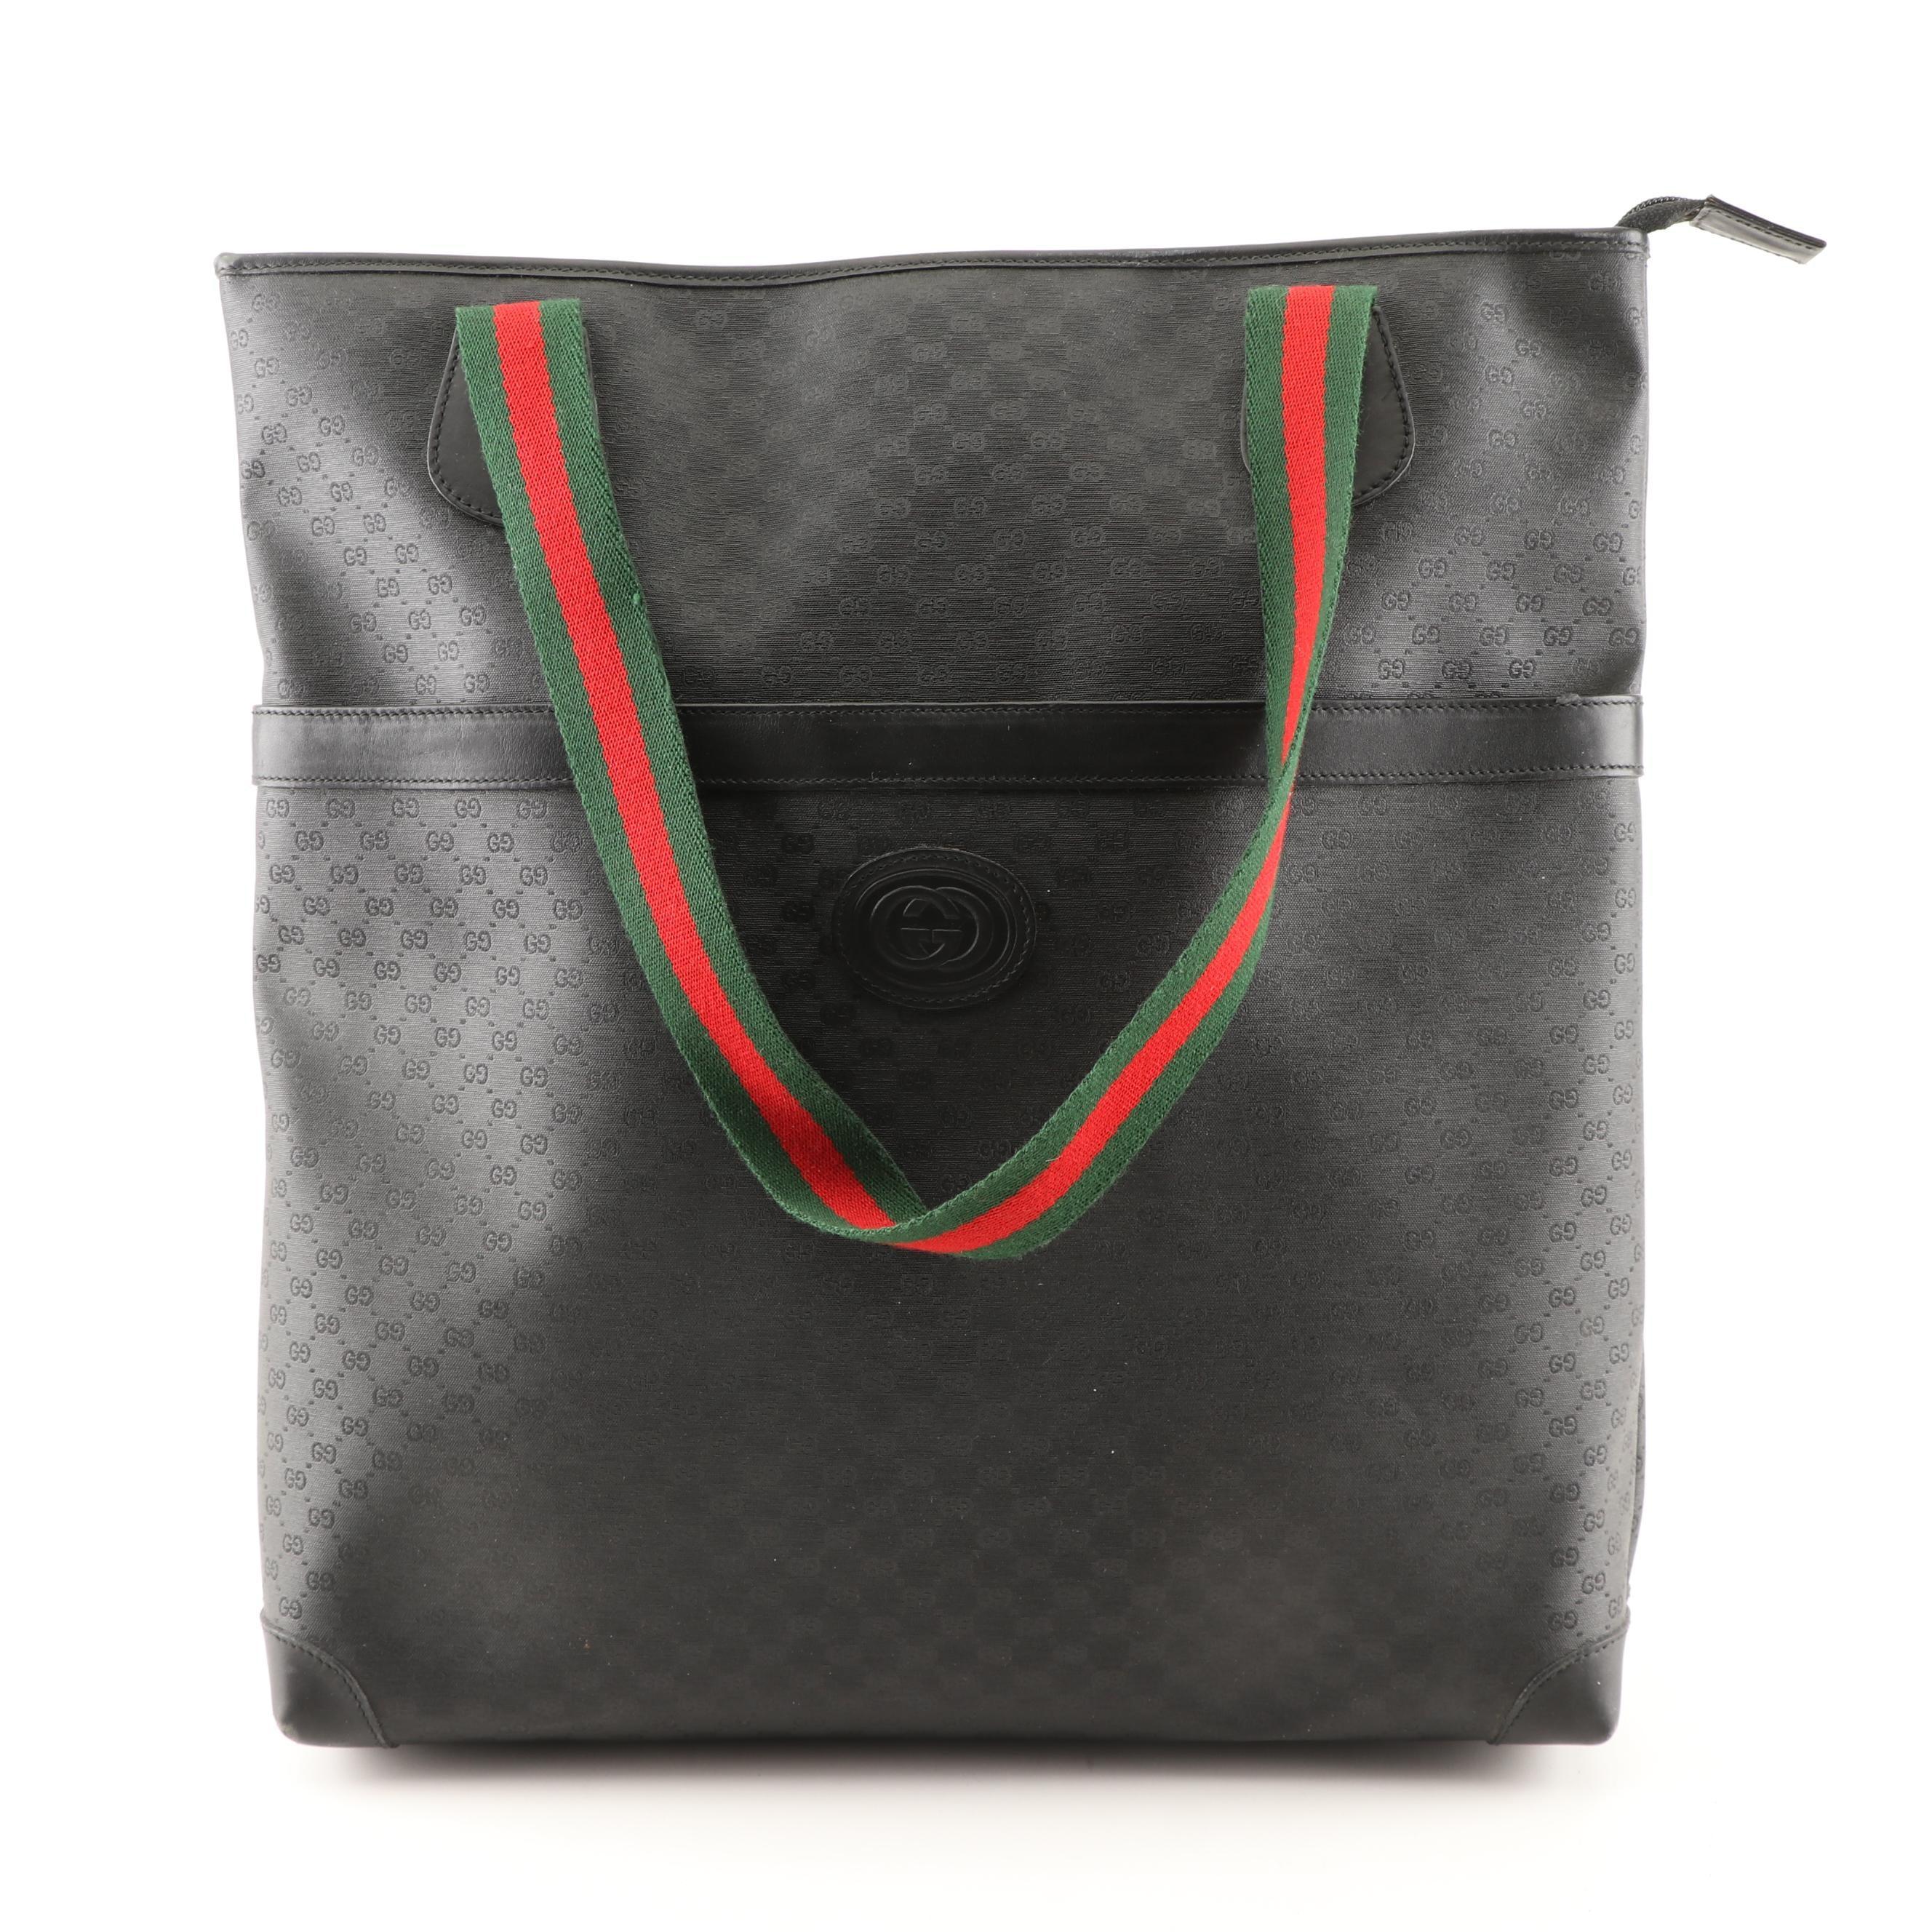 Gucci Black Supreme Canvas and Leather Tote Bag with Web Stripe Straps